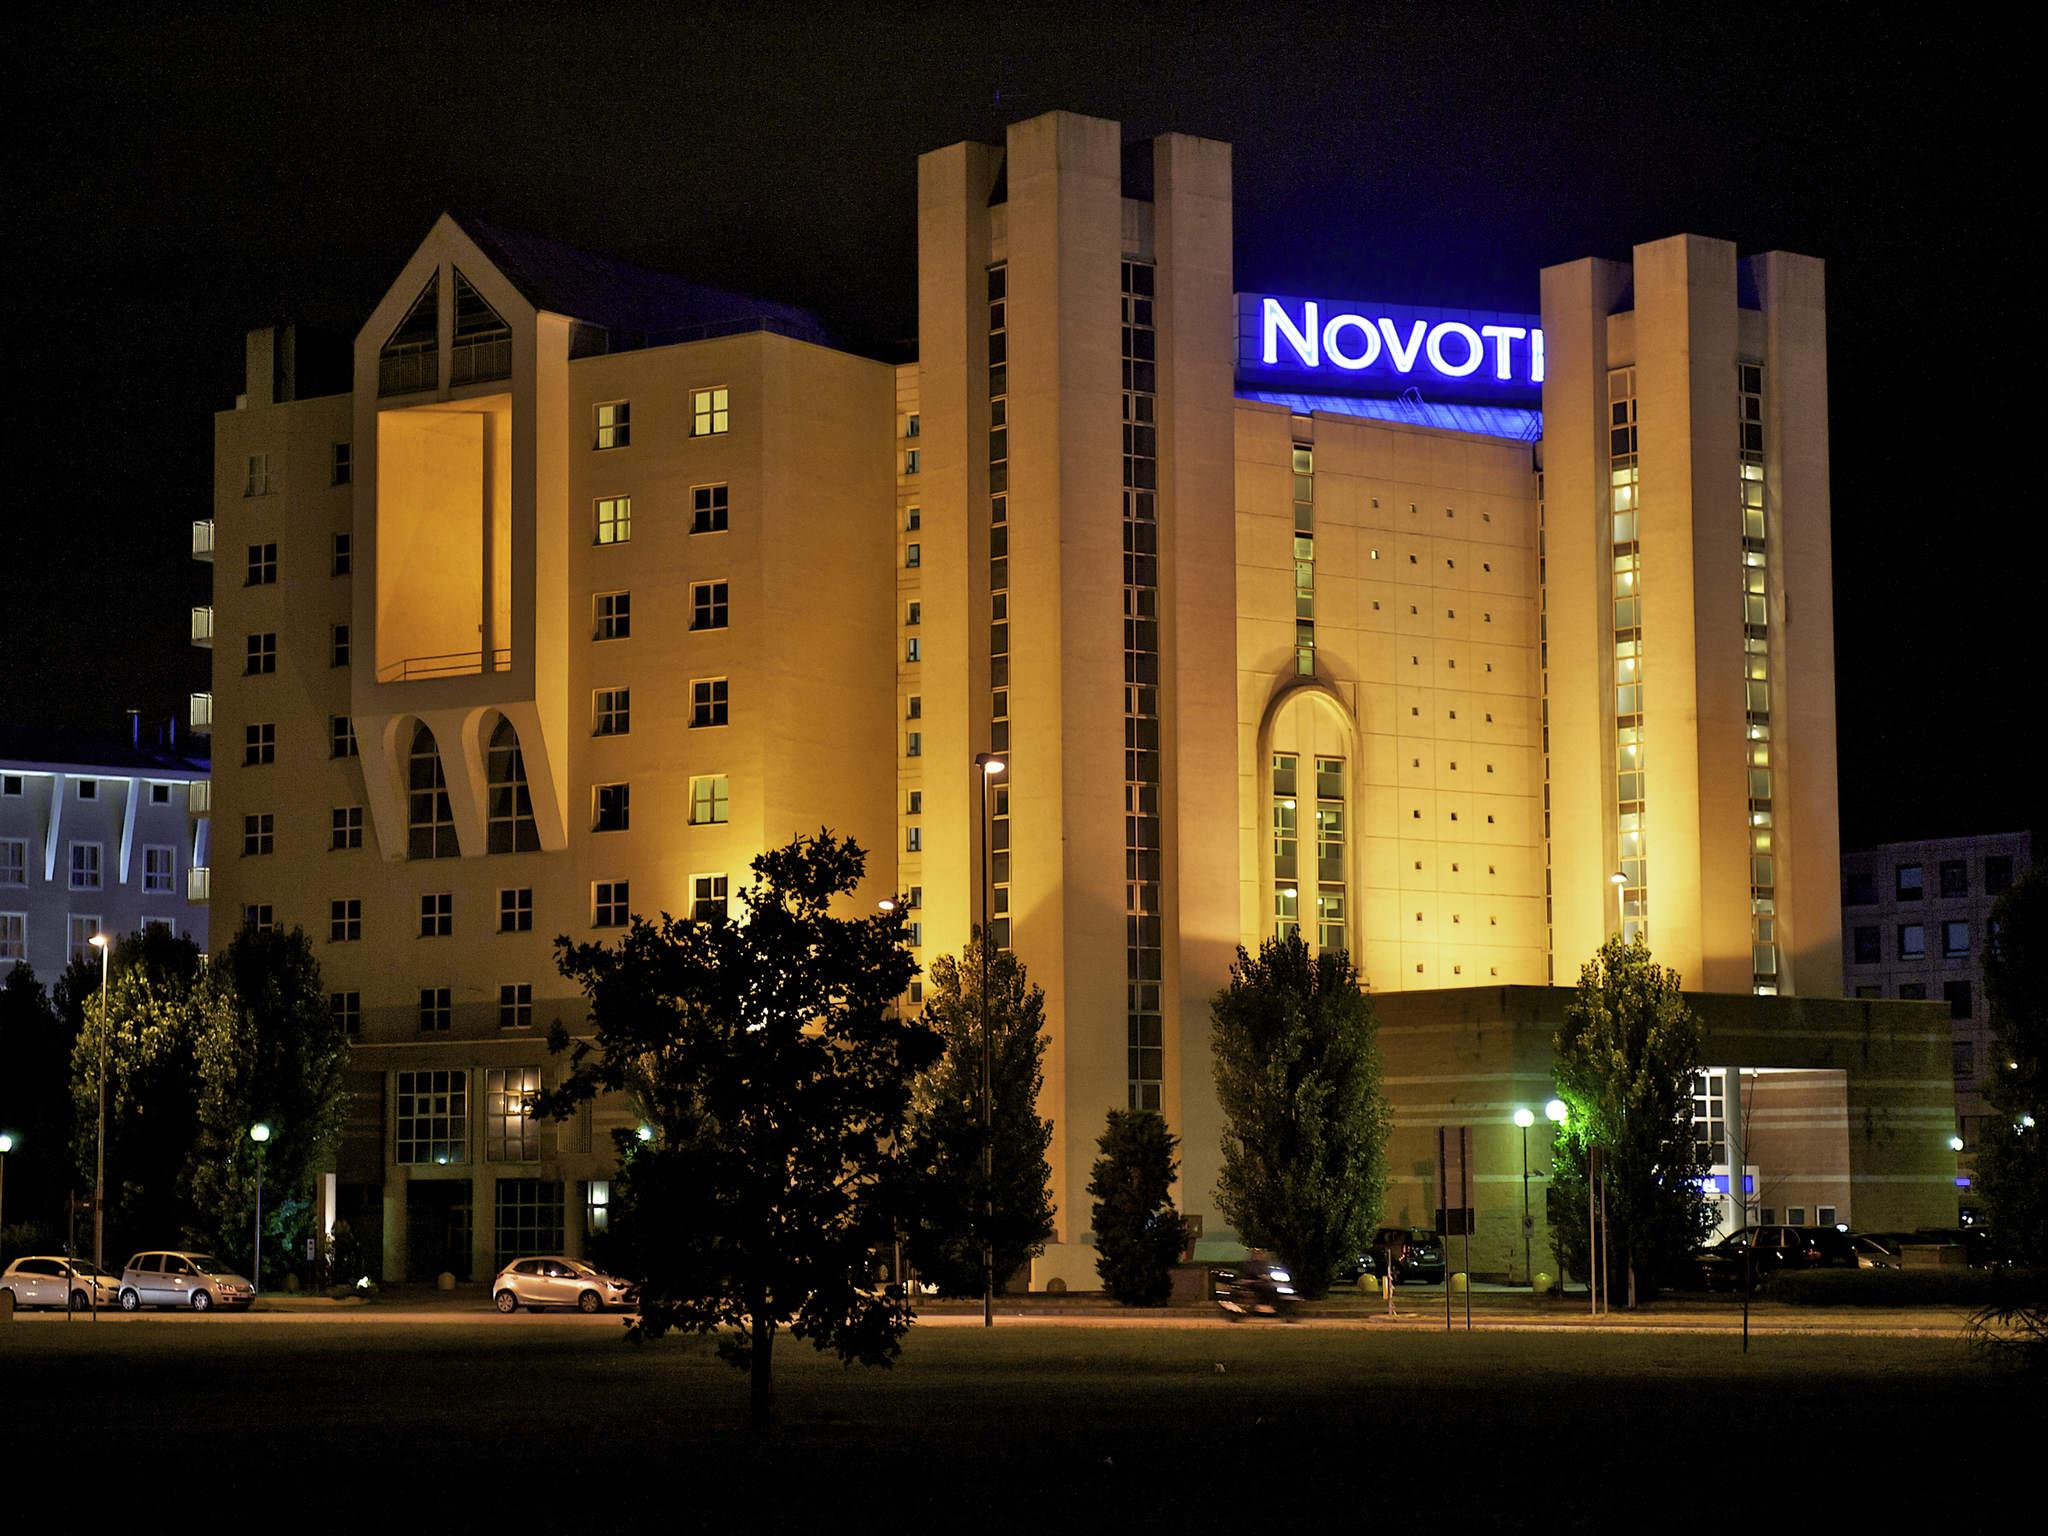 Hotel Novotel Florence Nord Aroport